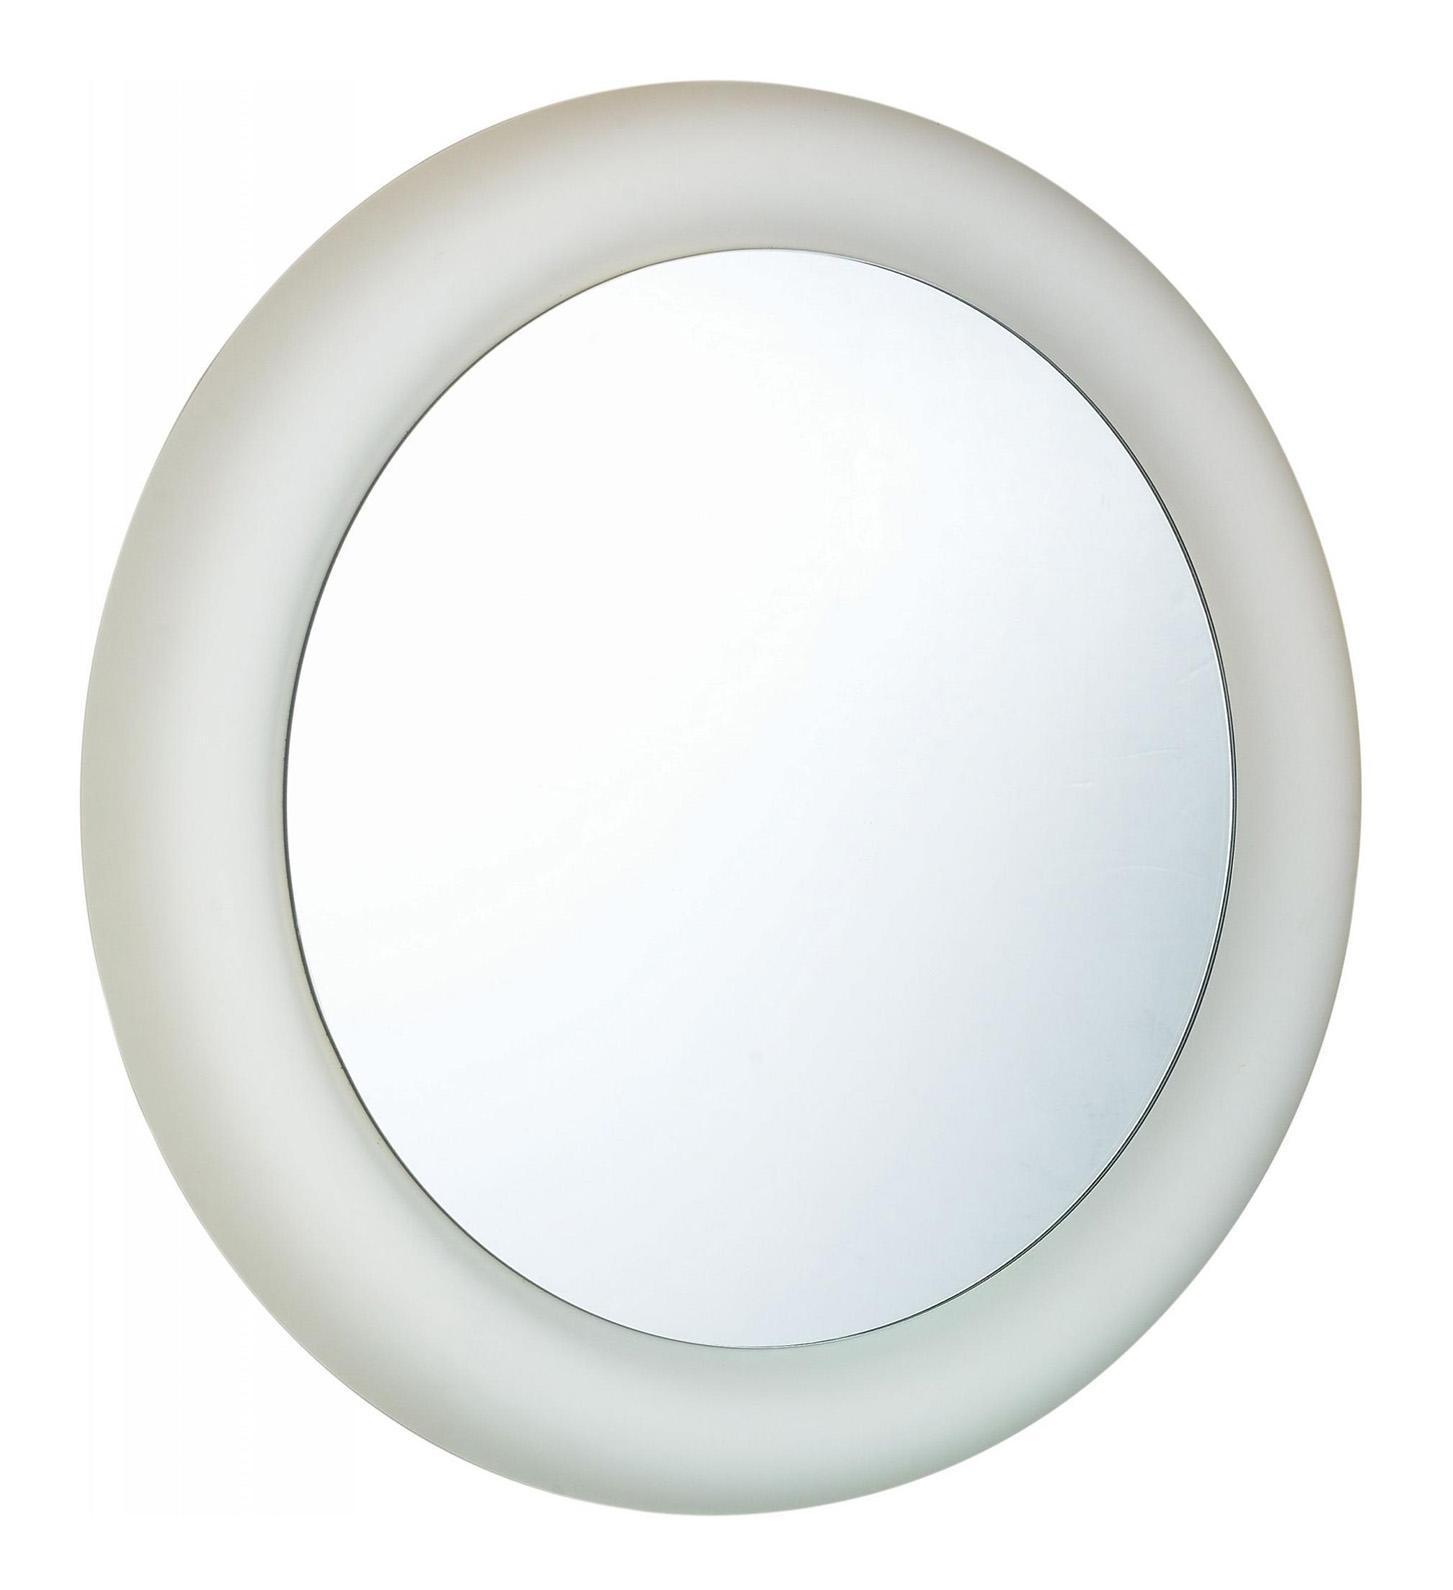 Светильник для ванной комнаты Arte lampСветильники для ванных комнат<br>Стиль светильника: модерн,<br>Назначение светильника: для ванной комнаты,<br>Материал светильника: стекло,<br>Высота: 100,<br>Диаметр: 430,<br>Мощность: 120,<br>Количество ламп: 3,<br>Тип лампы: накаливания,<br>Патрон: Е14,<br>Цвет арматуры: белый,<br>Вес нетто: 4.8<br>